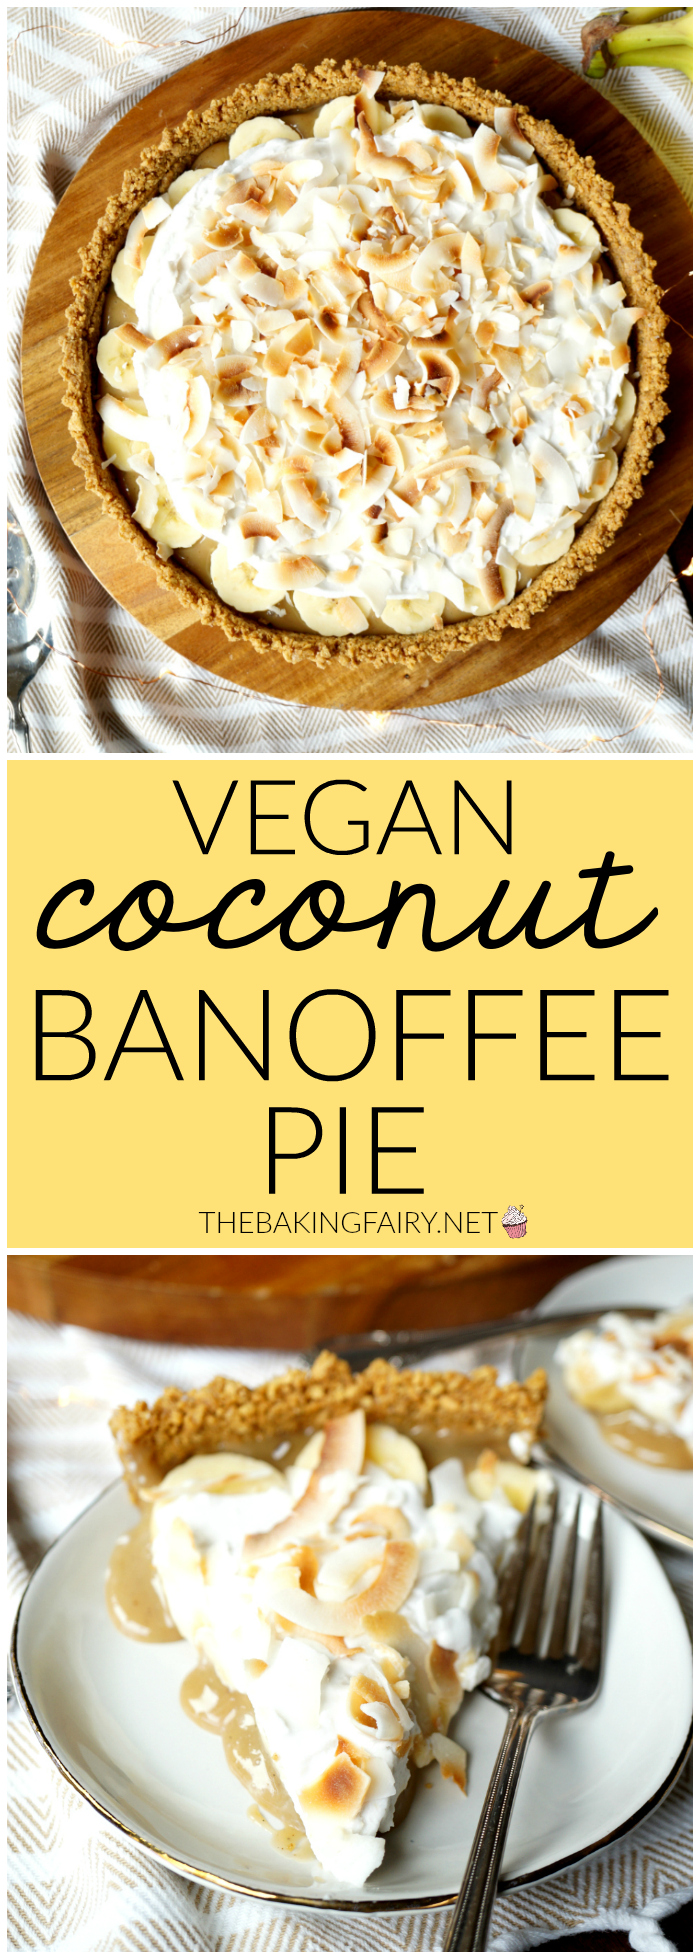 vegan coconut banoffee pie | The Baking Fairy